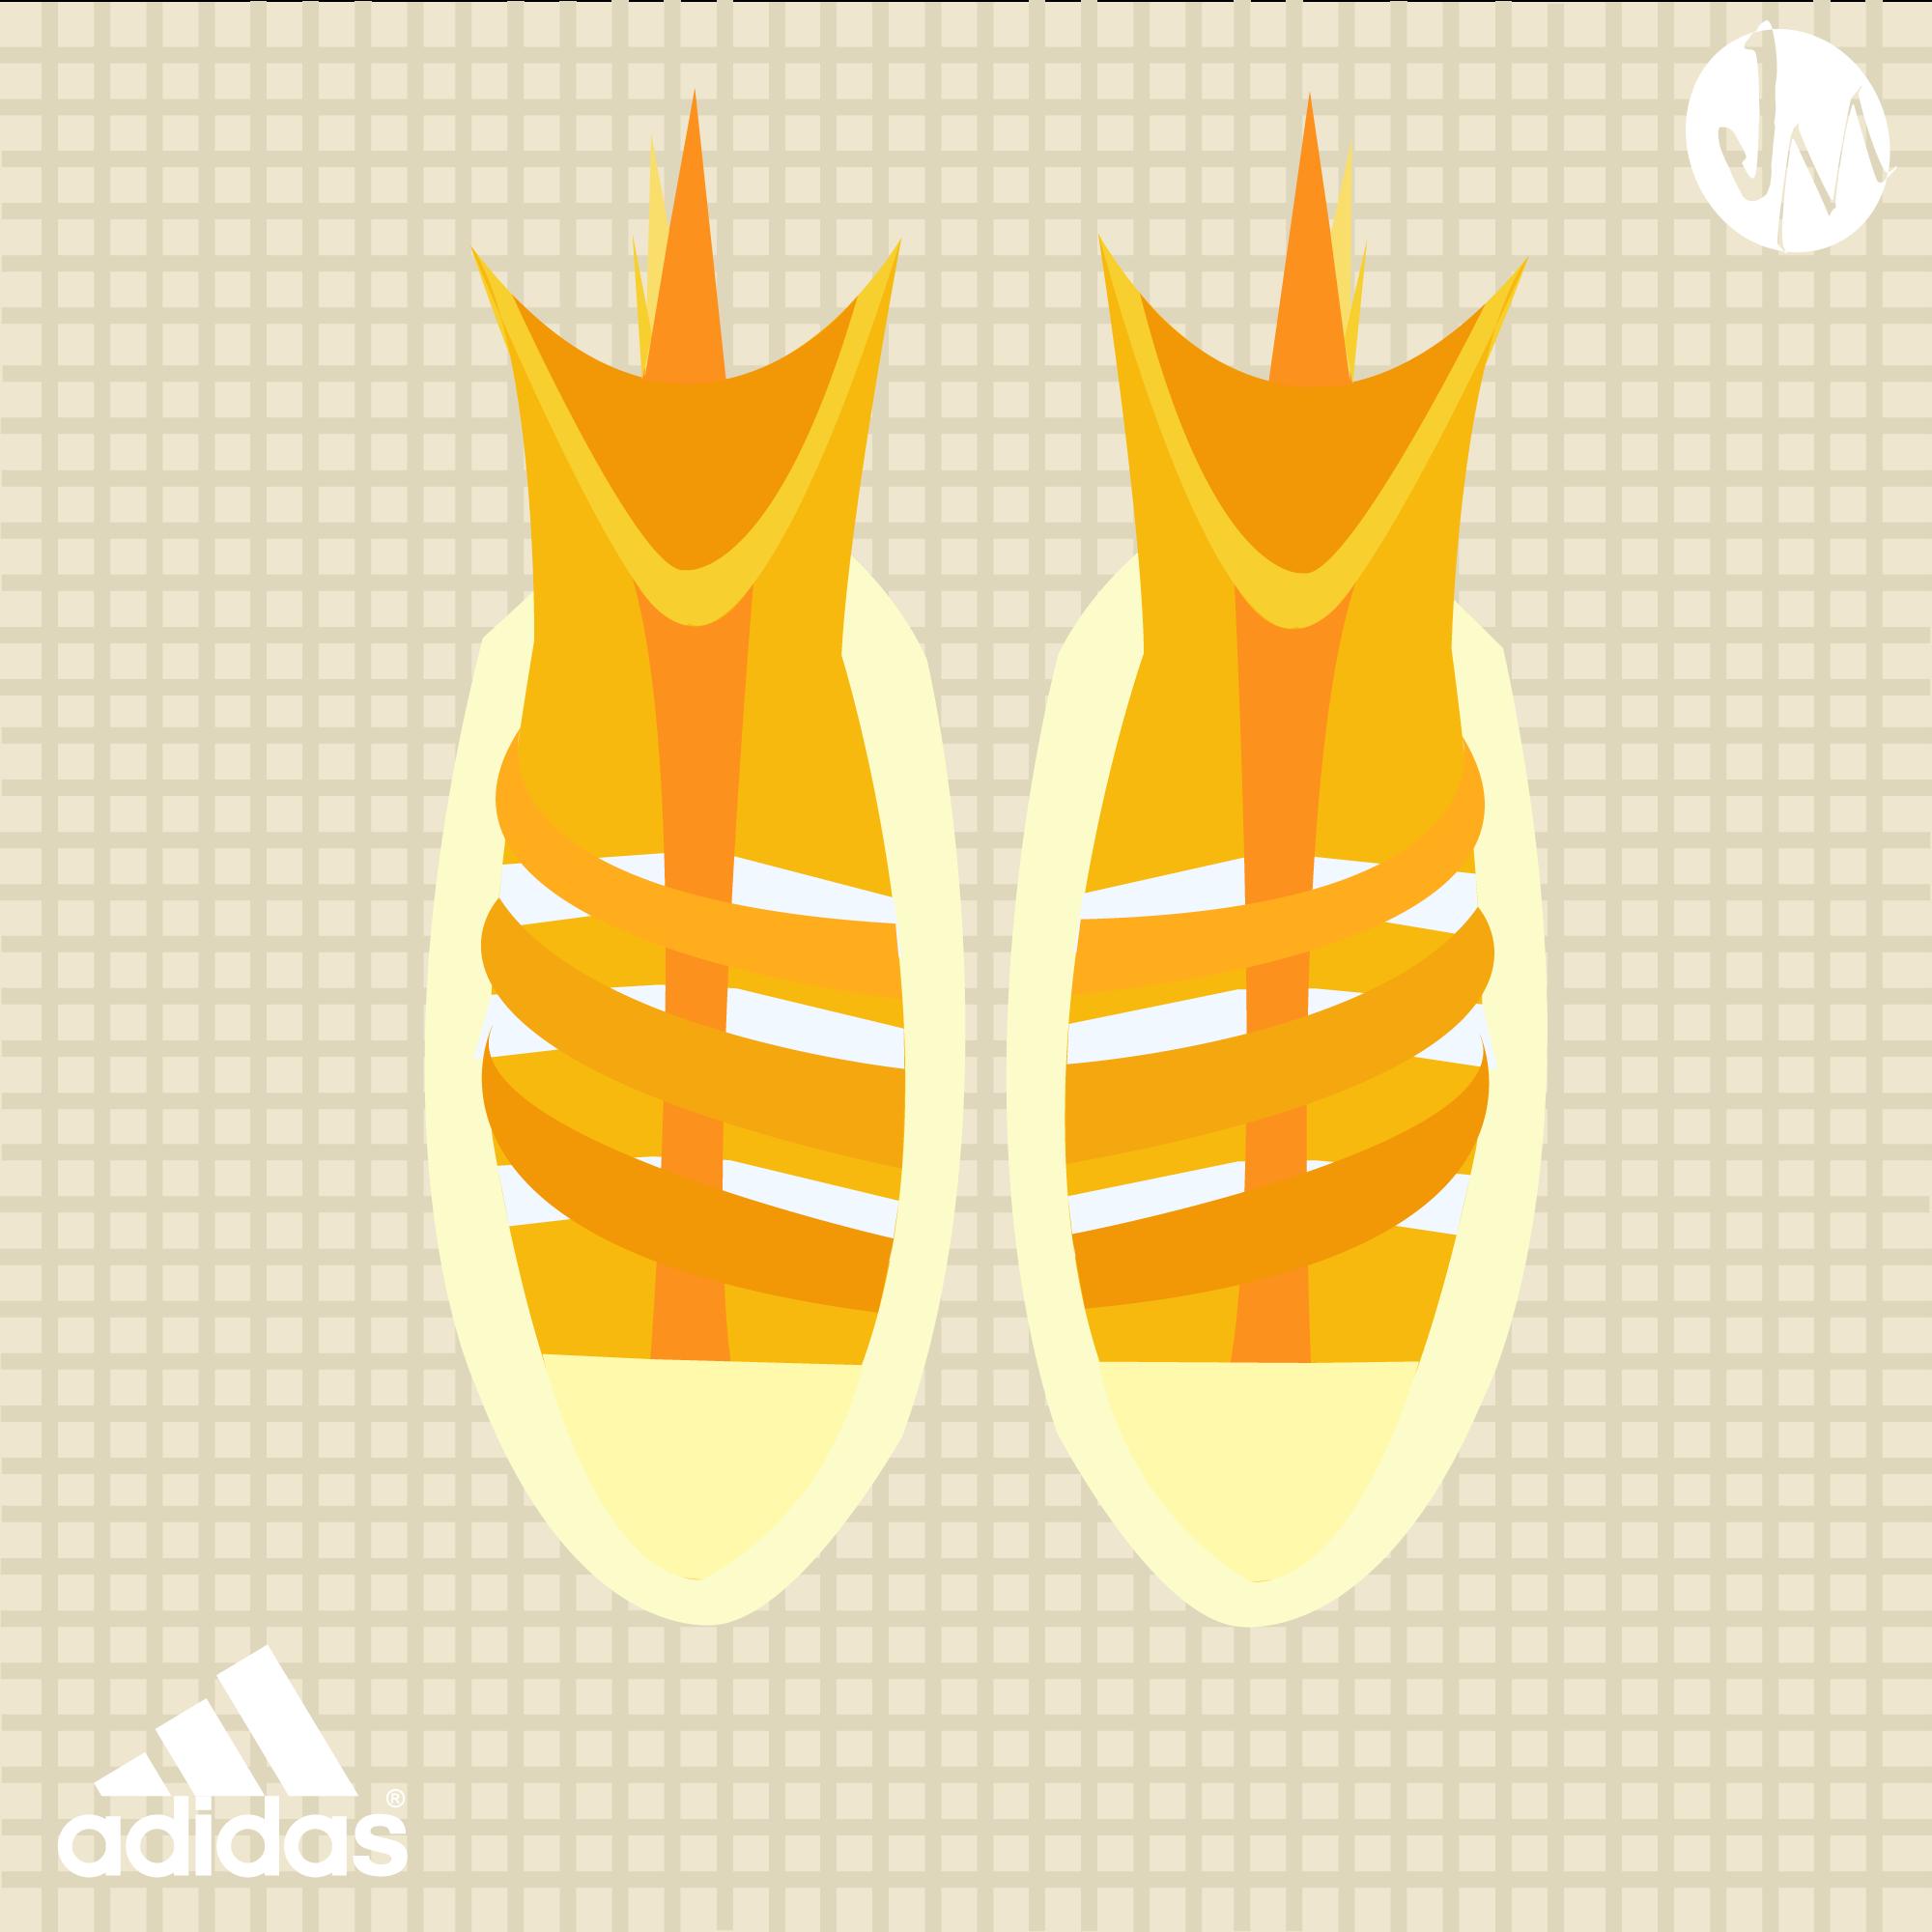 Adidas-Sunburst-High3.png